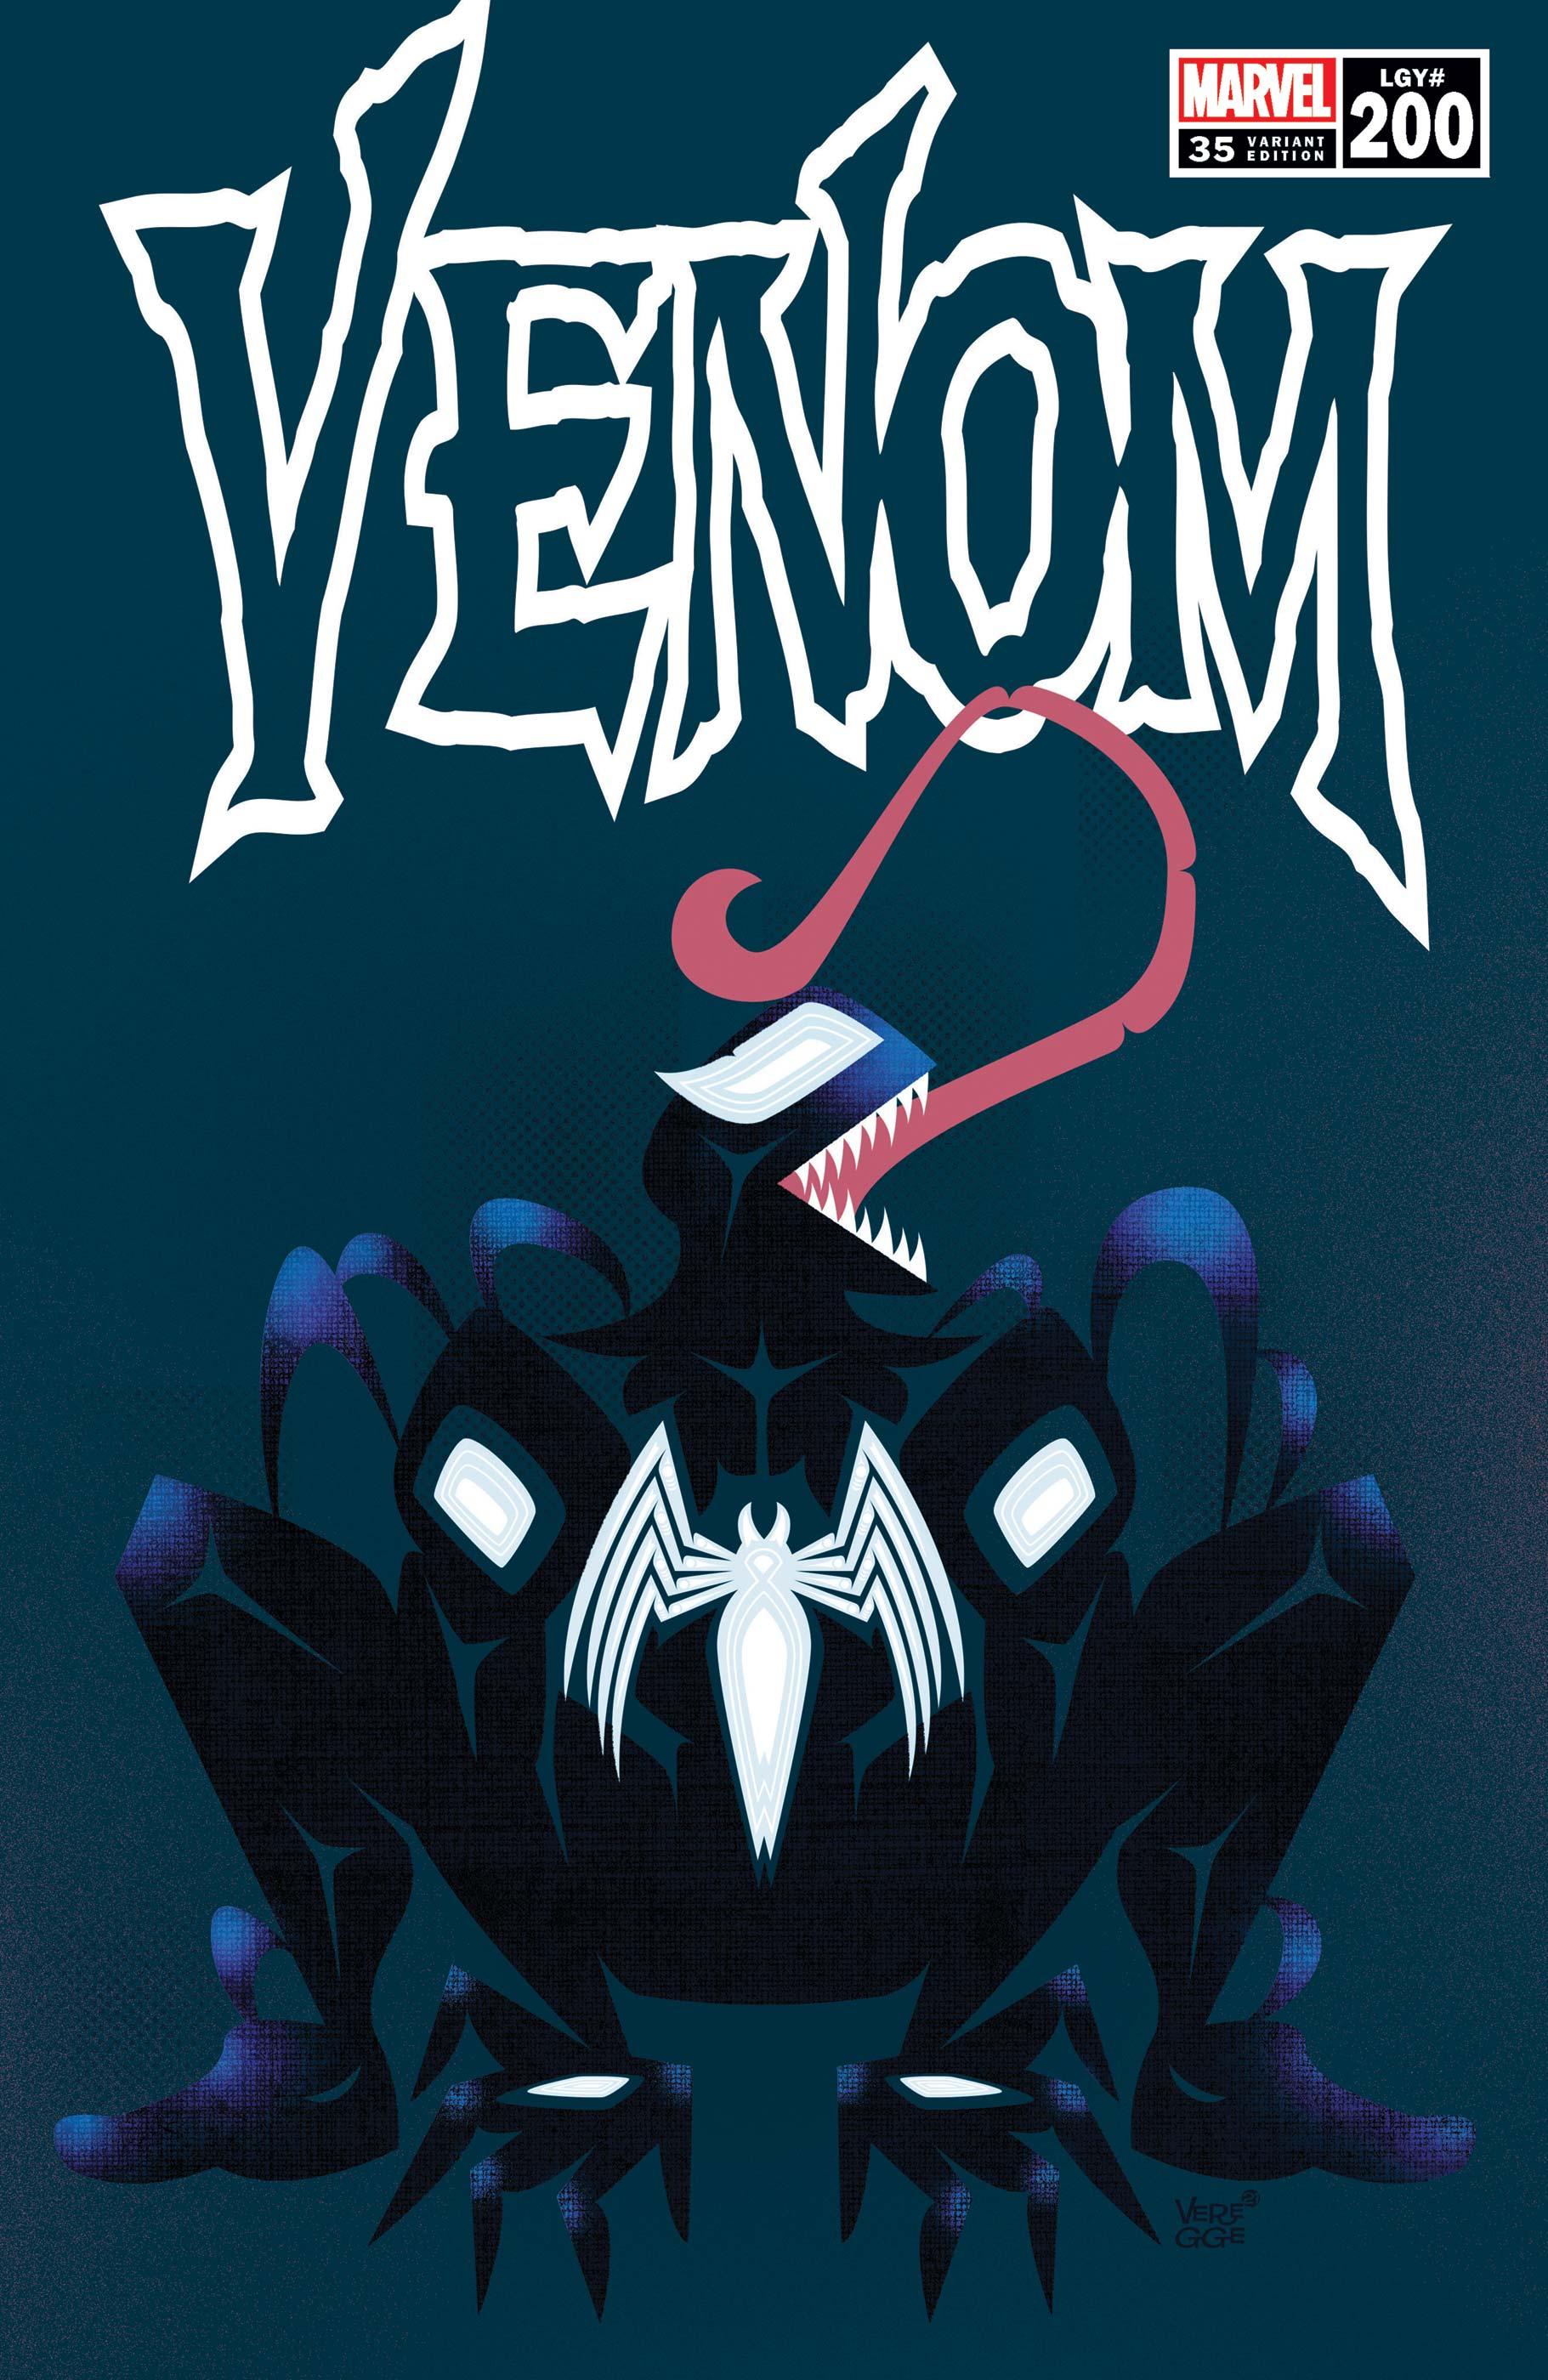 Venom (2018) #35 (Variant)